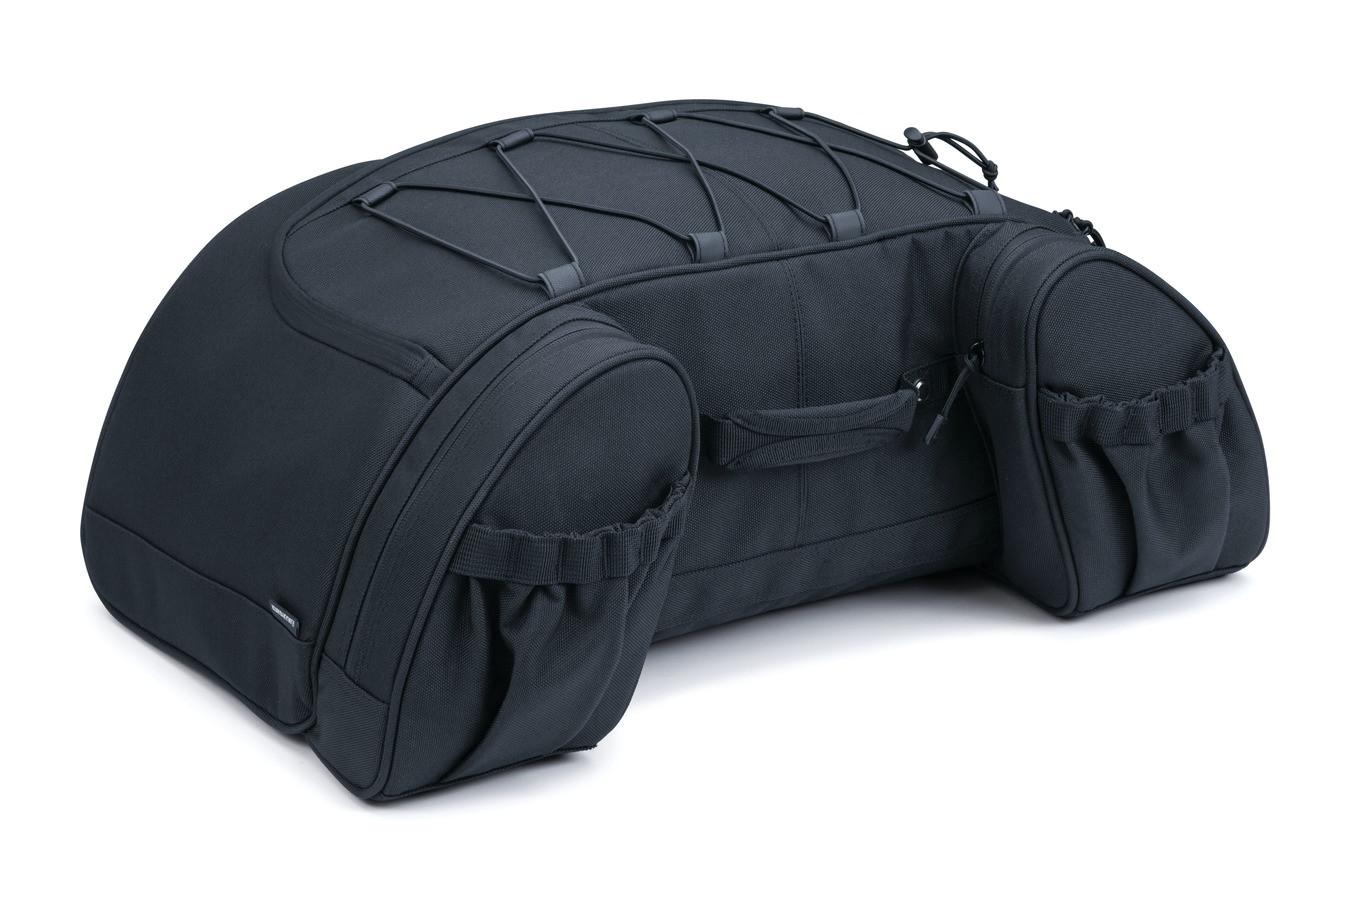 Momentum Hitchhiker Trunk Rack Bag STARNSANDSONS.COM